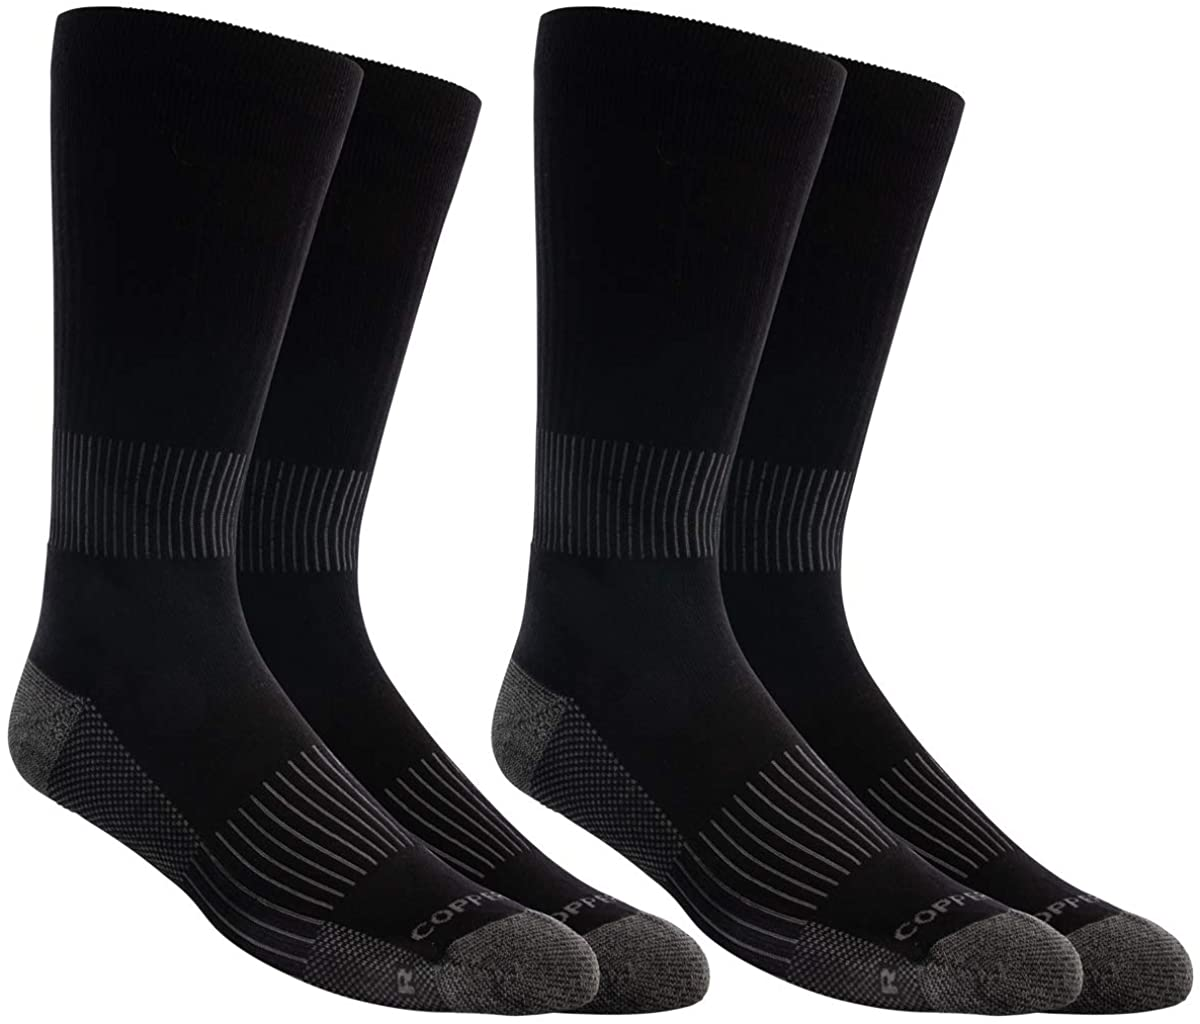 Copper Fit Men's Compression Sports Crew Socks 2 Pairs Per Pack